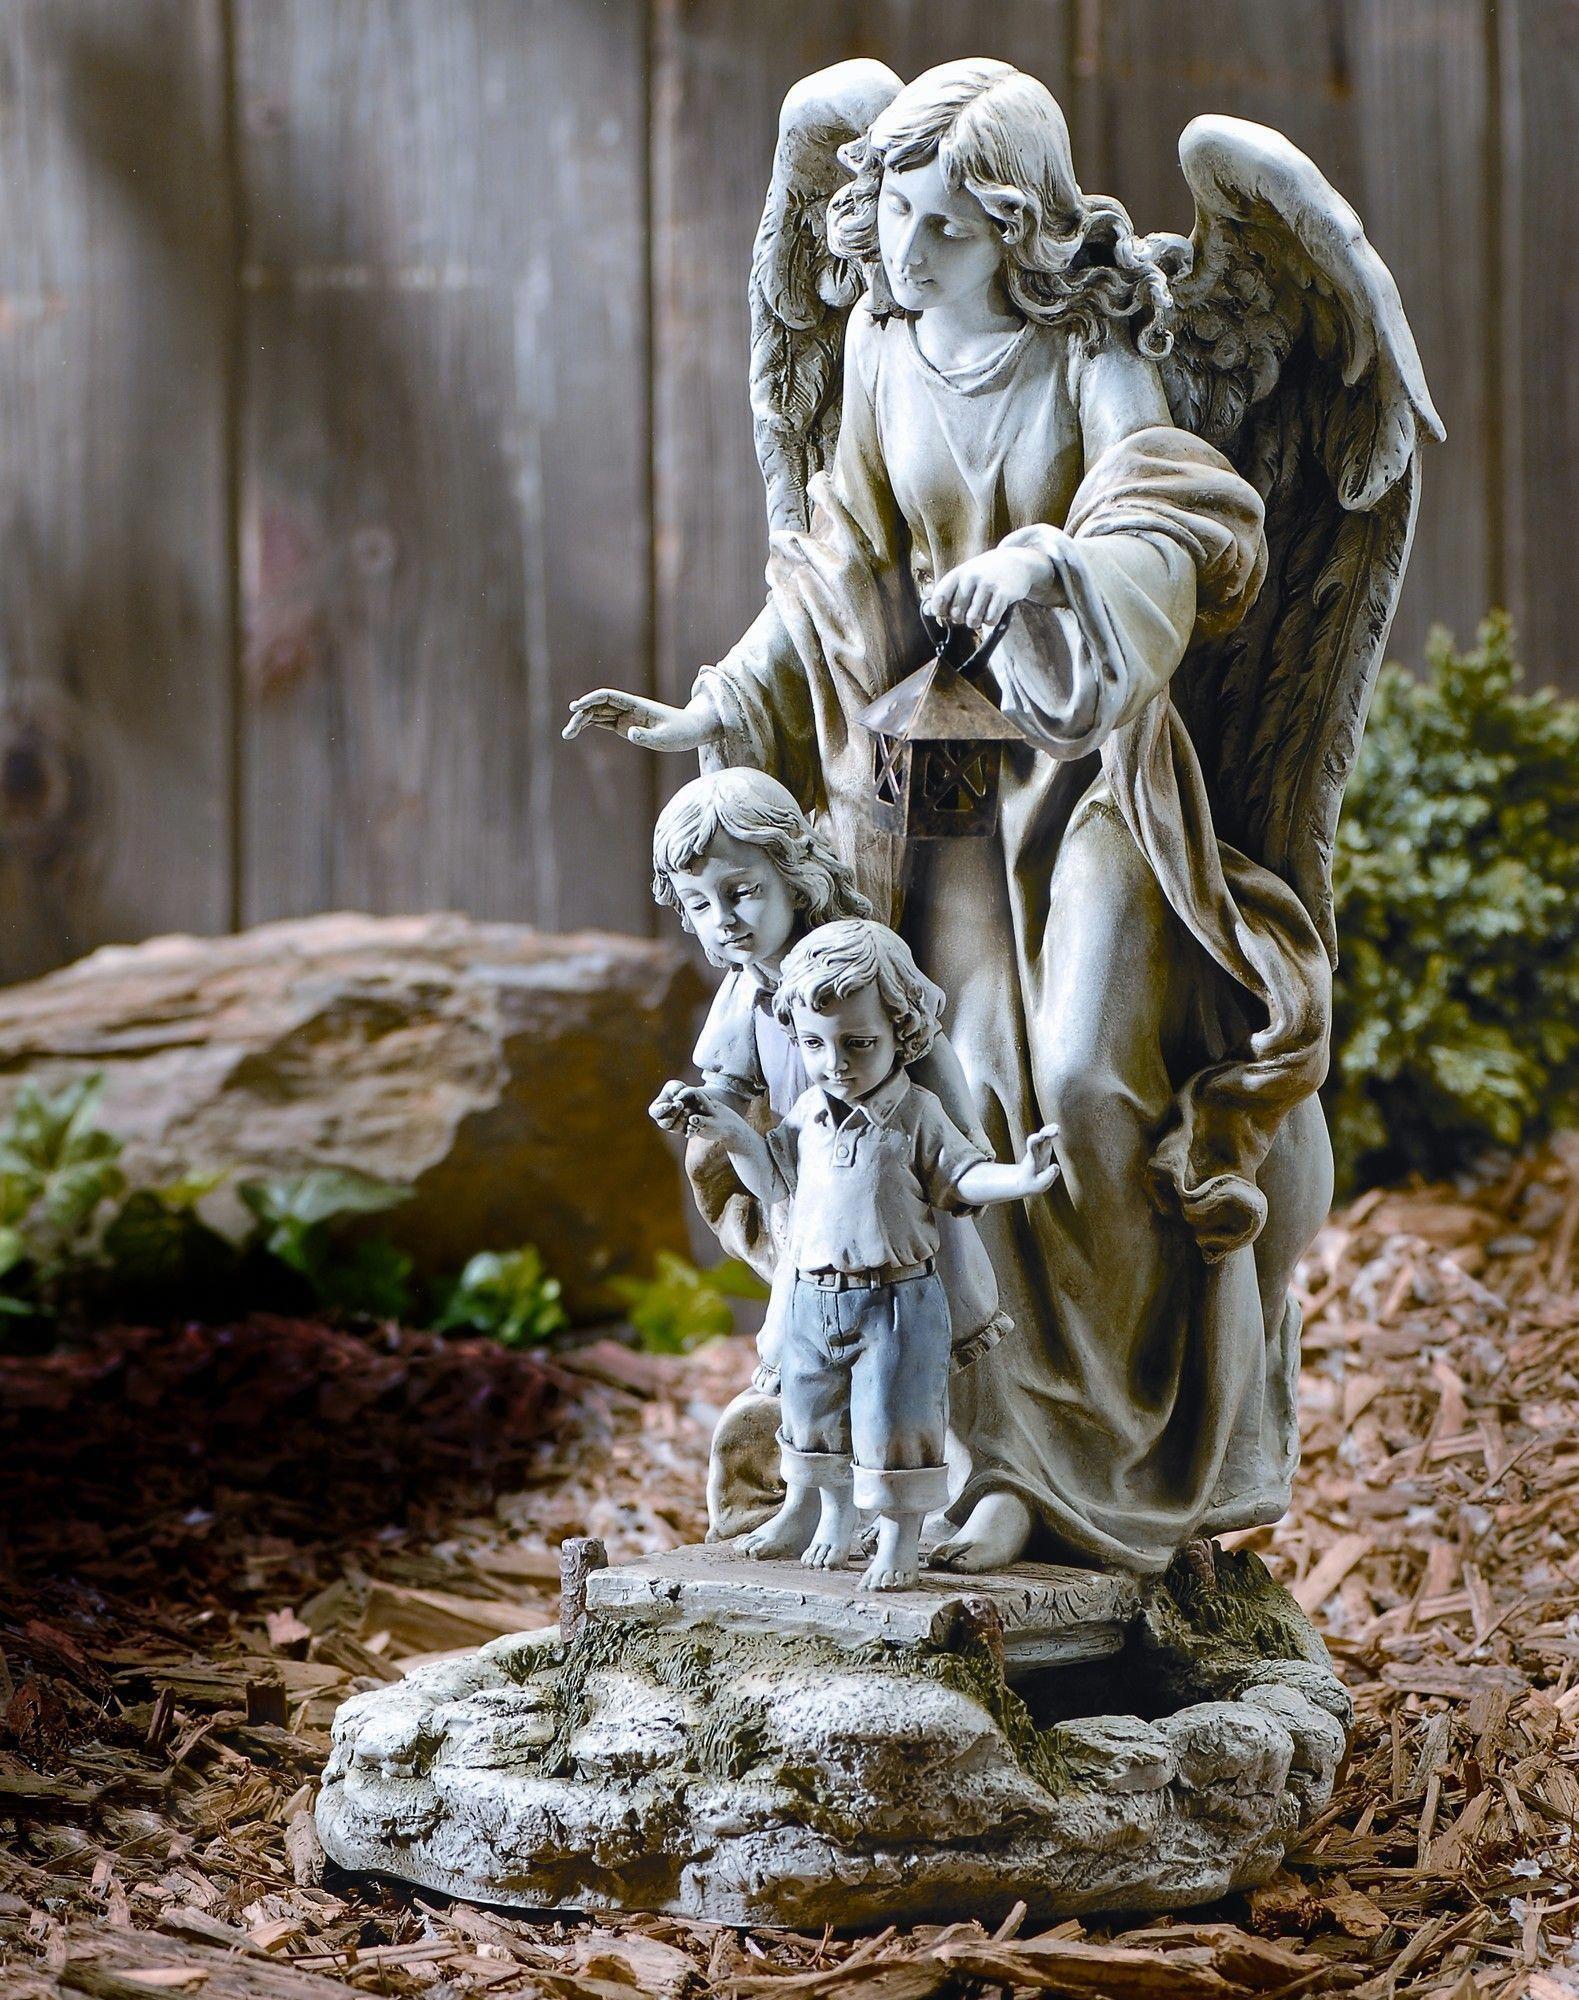 Statues For Front Porch Statuesyardartforsale Code 5886904853